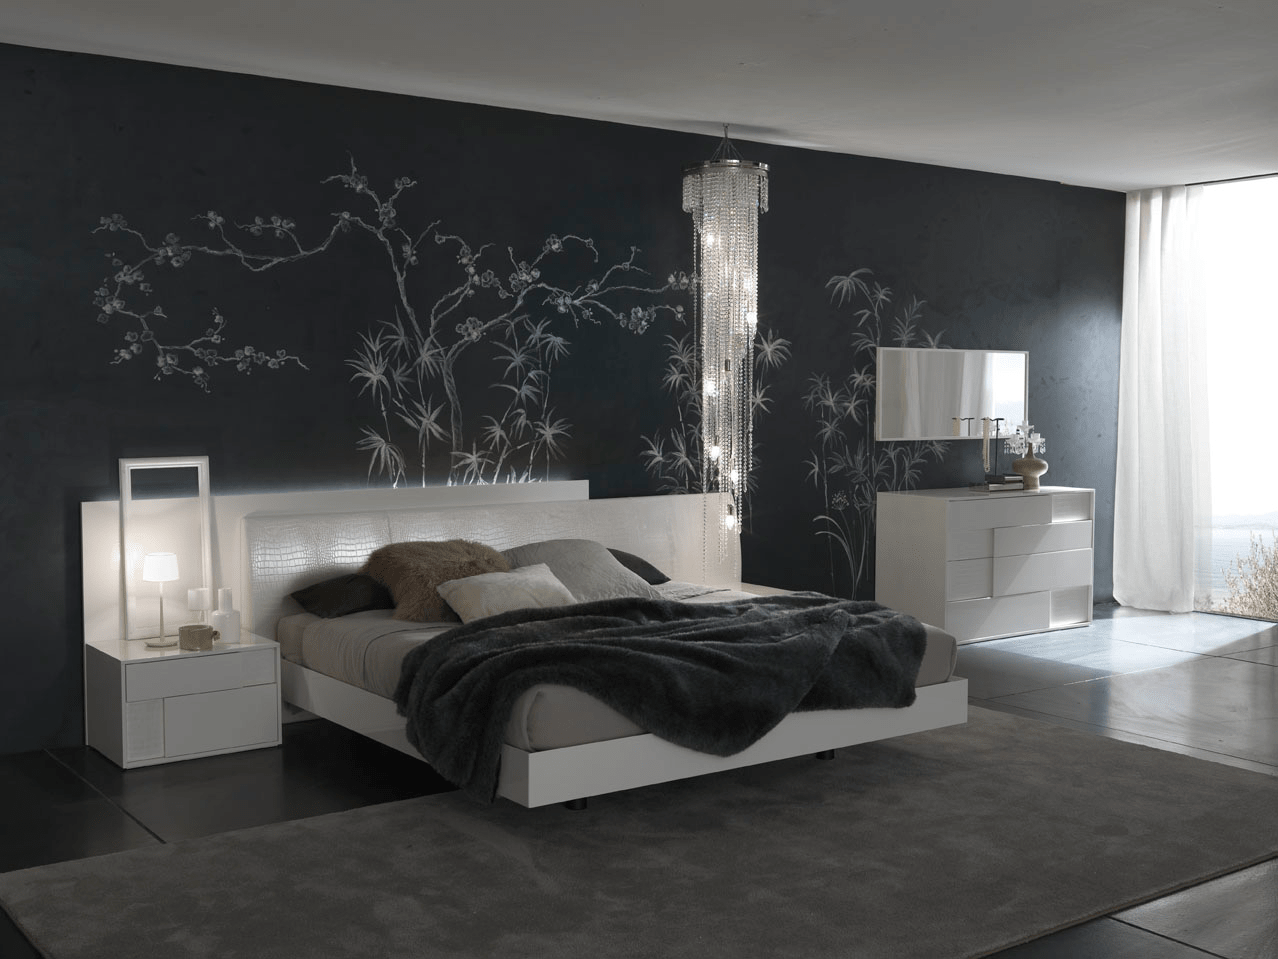 How to decorate grey bedroom